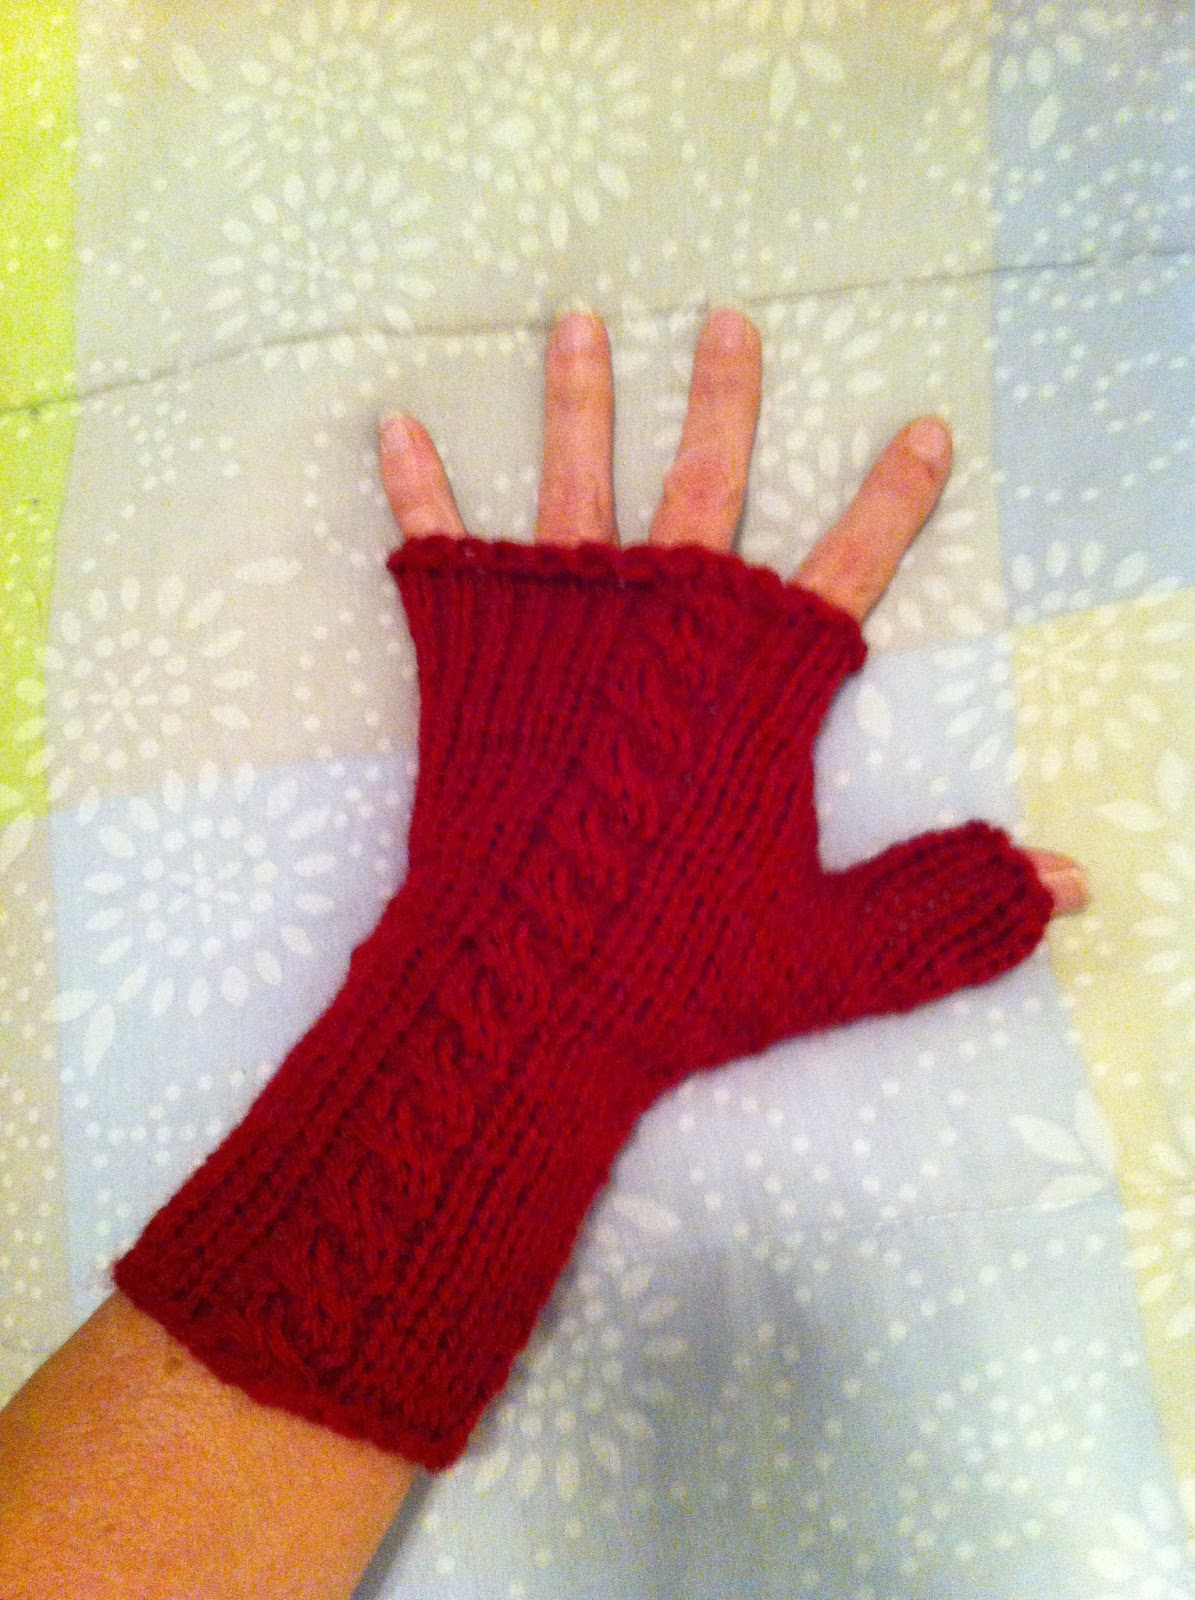 Machine knitting fun fingerless gloves by karalyn machine knitting fun jeuxipadfo Image collections